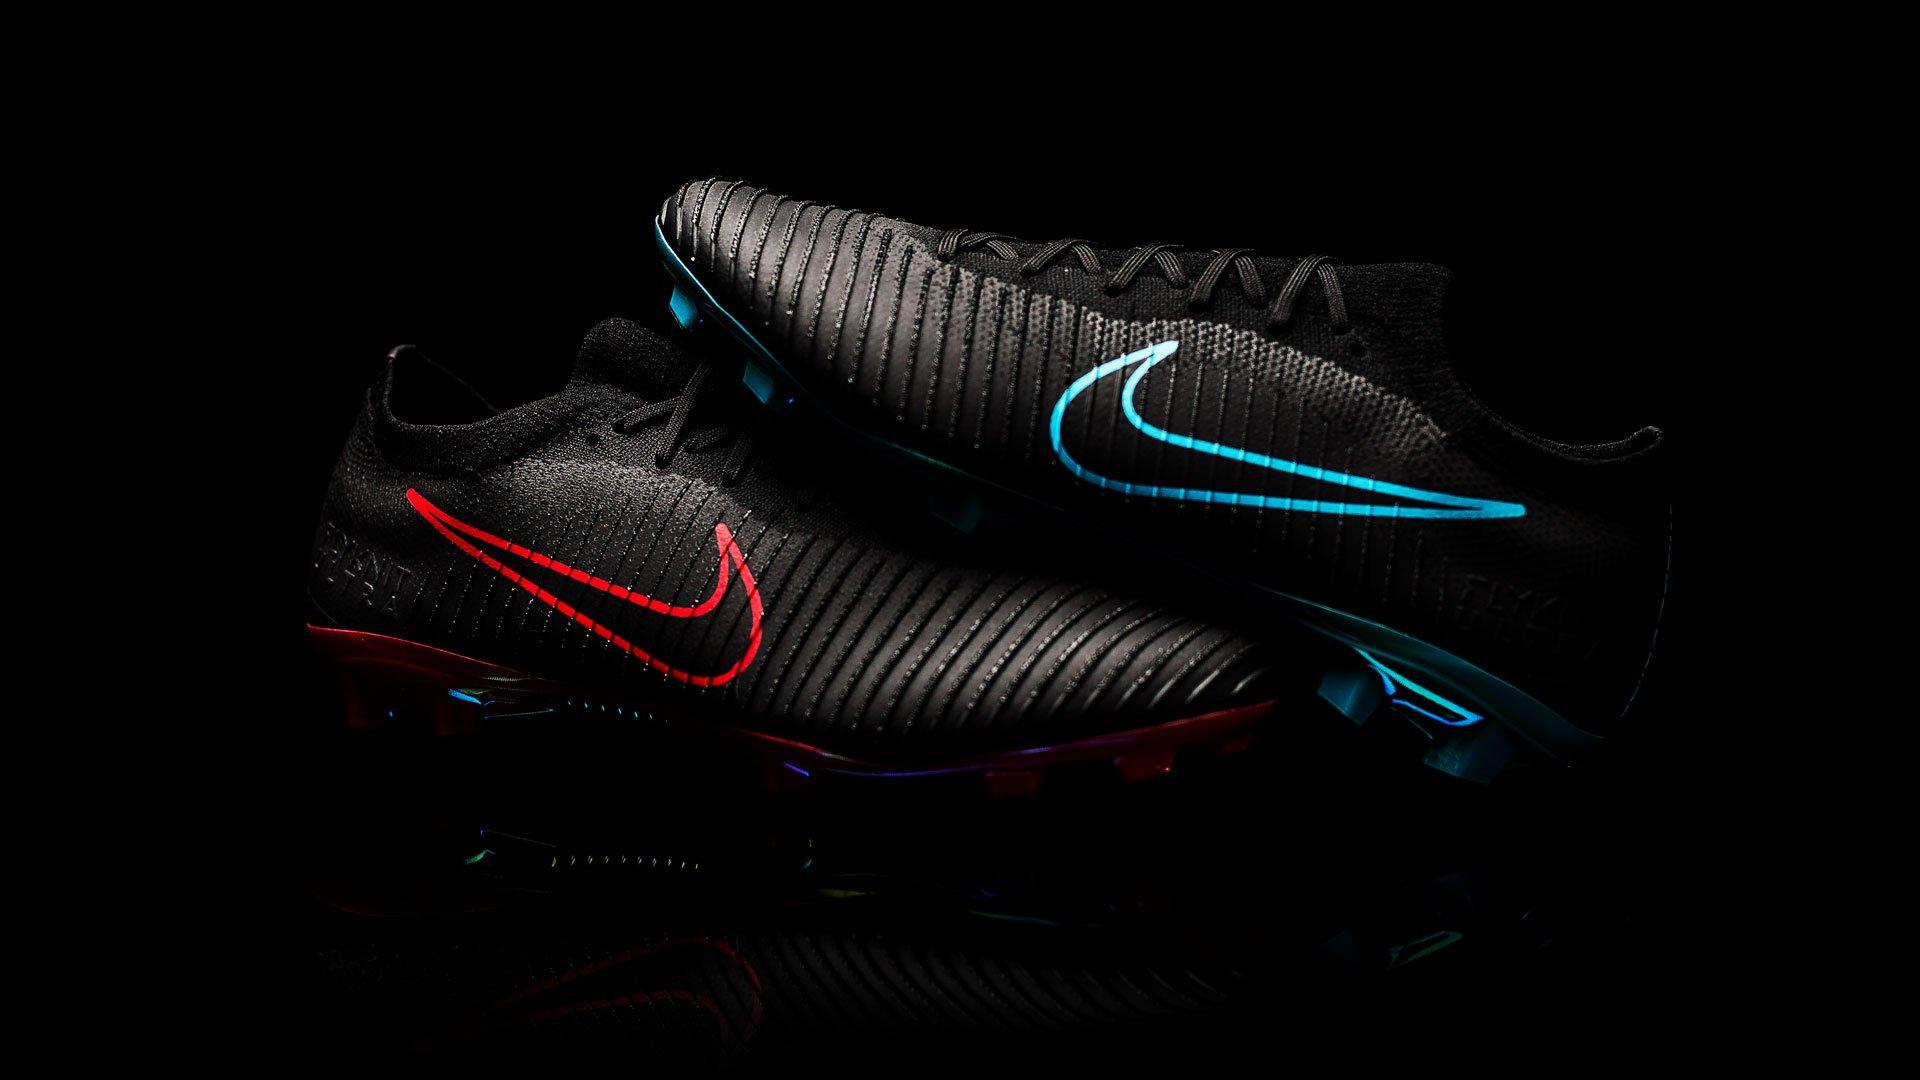 Découvrez les Nike Mercurial Vapor Flyknit Ultra 'Play Fire